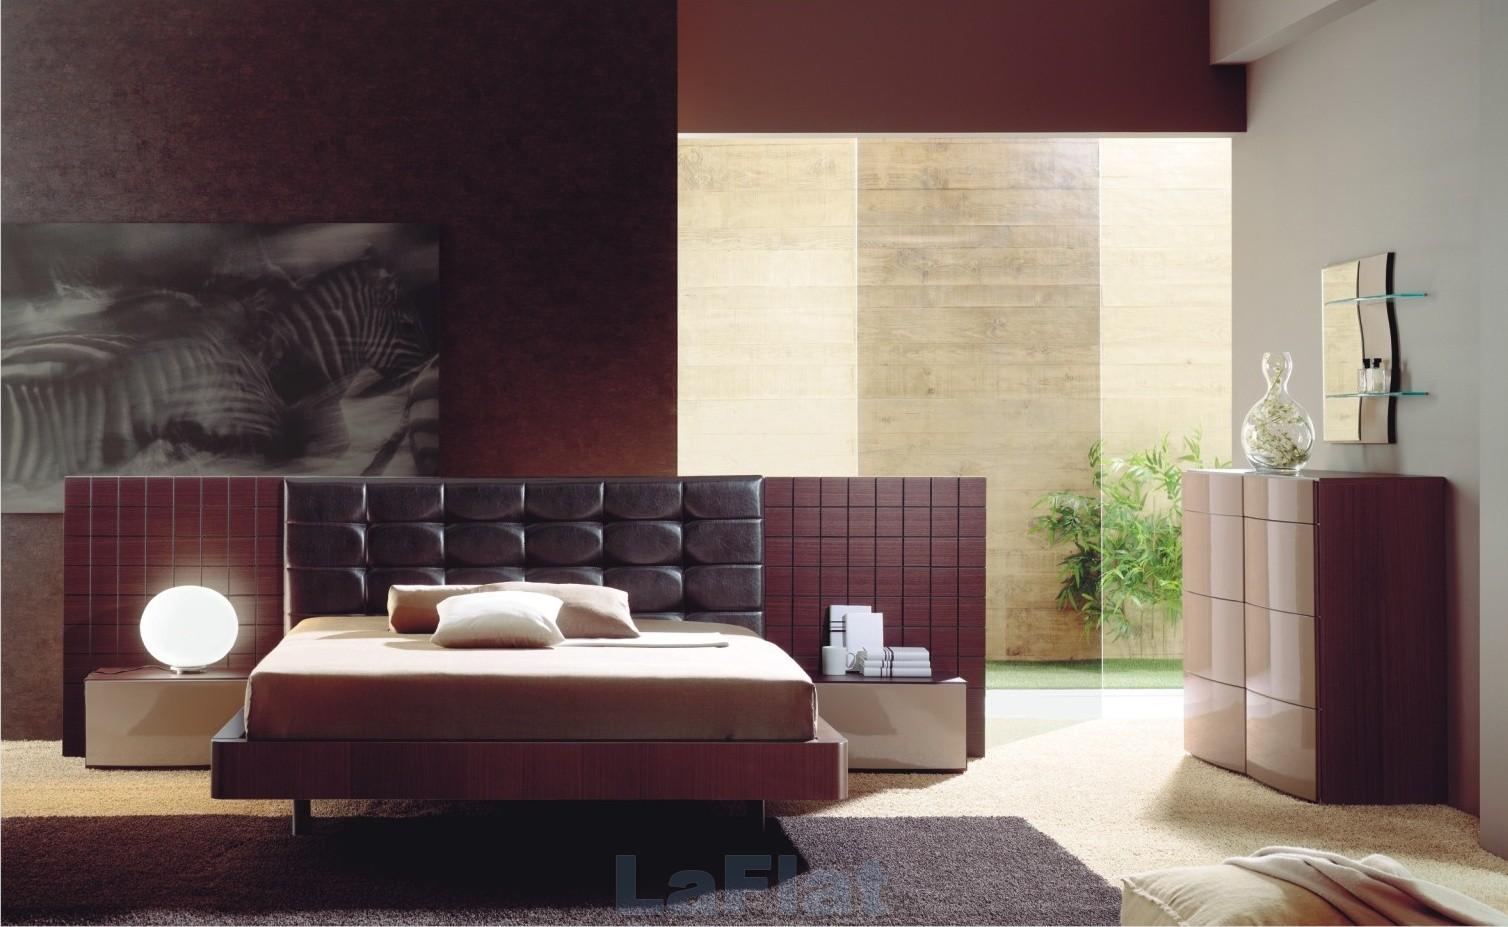 Interior Decorating Ideas | Dreams House Furniture